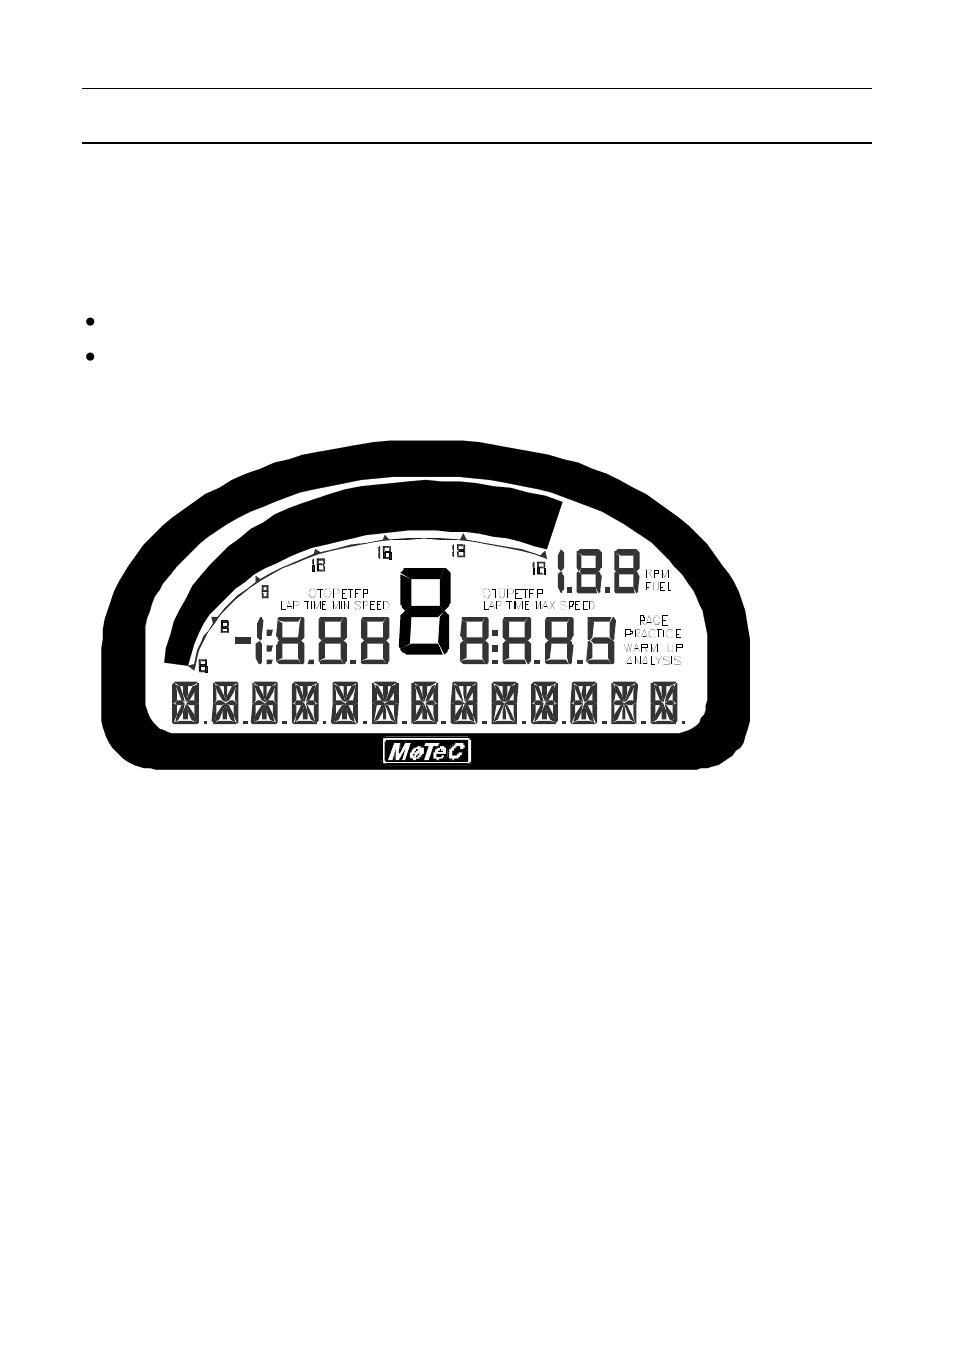 Display   MoTeC ADL3 EDL3 User Manual   Page 31 / 80